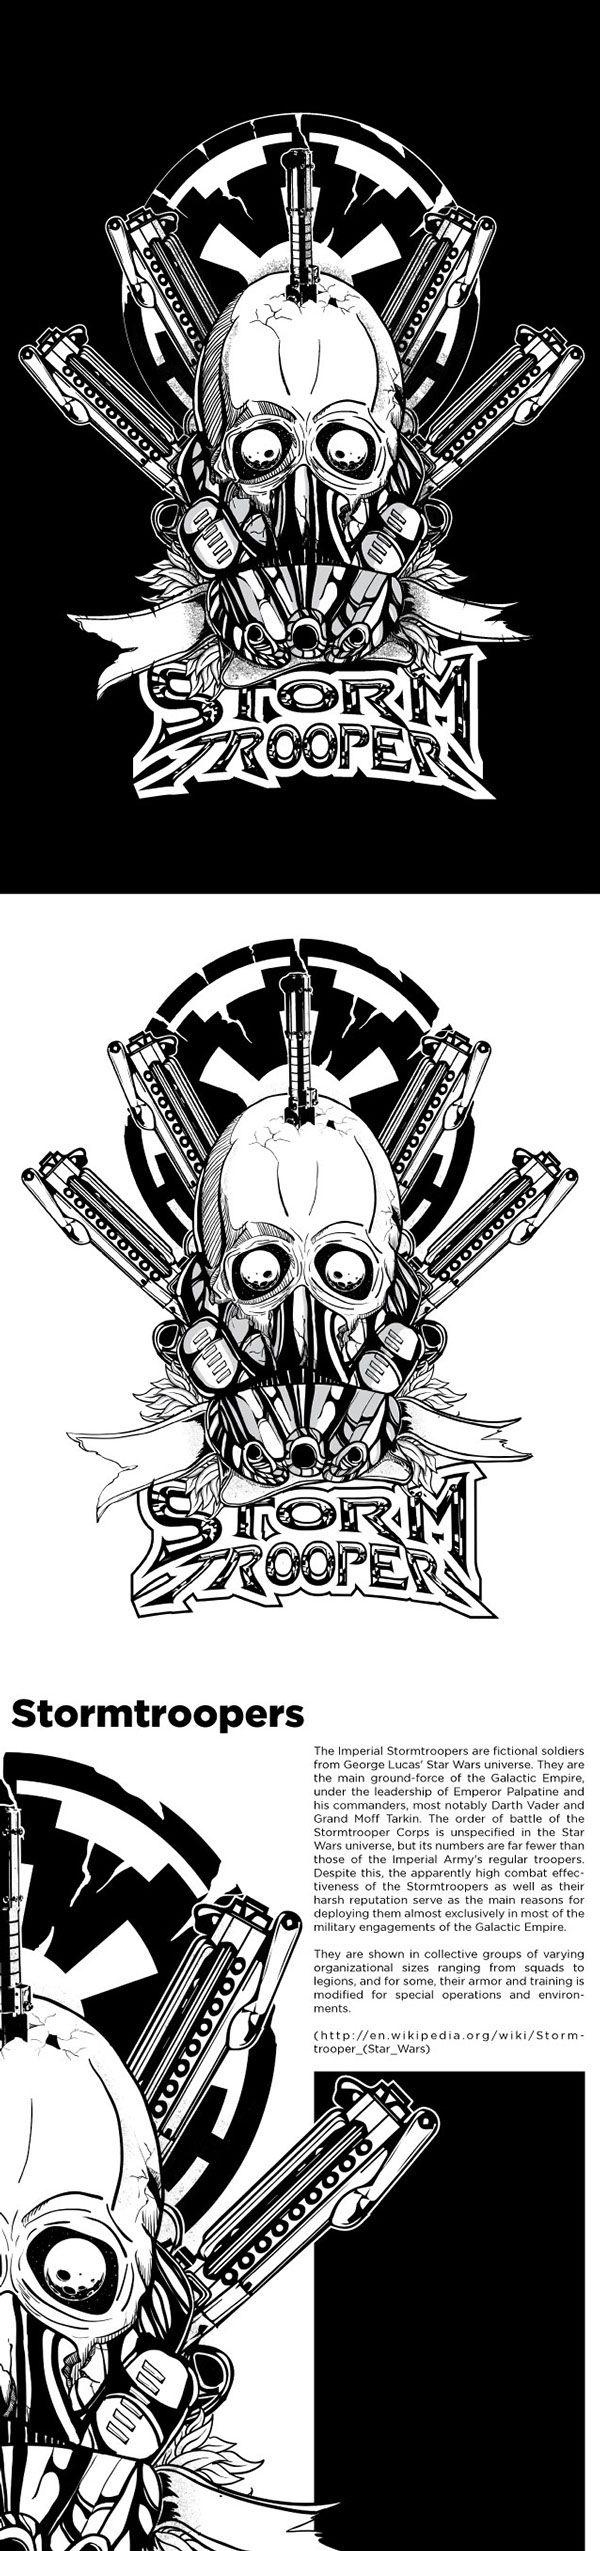 fighting spirit stormtroopers on Behance